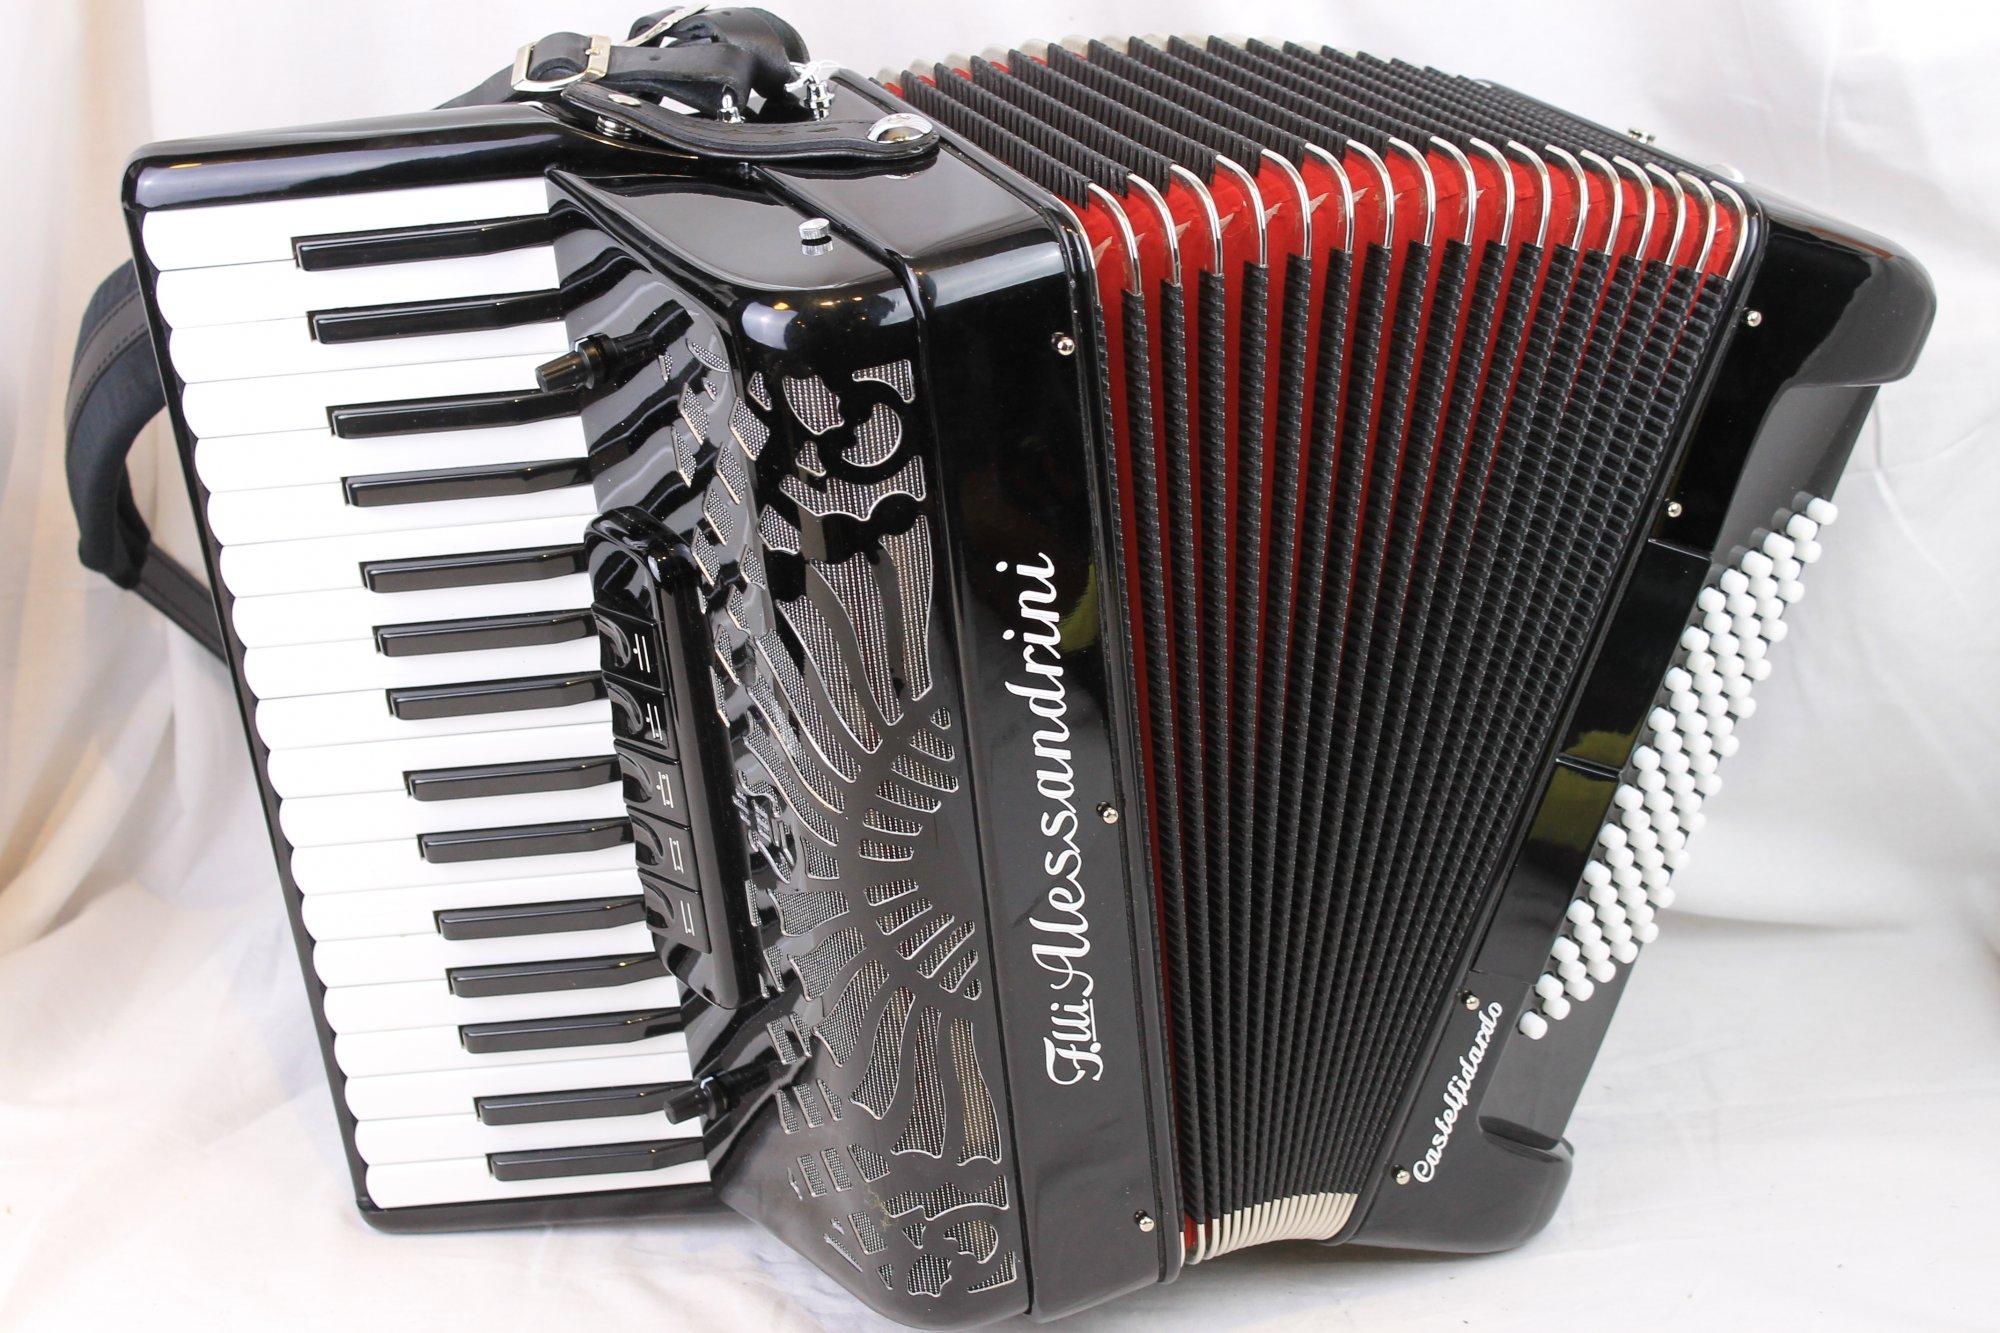 2953 - Black Alessandrini Piano Accordion LMM 34 72